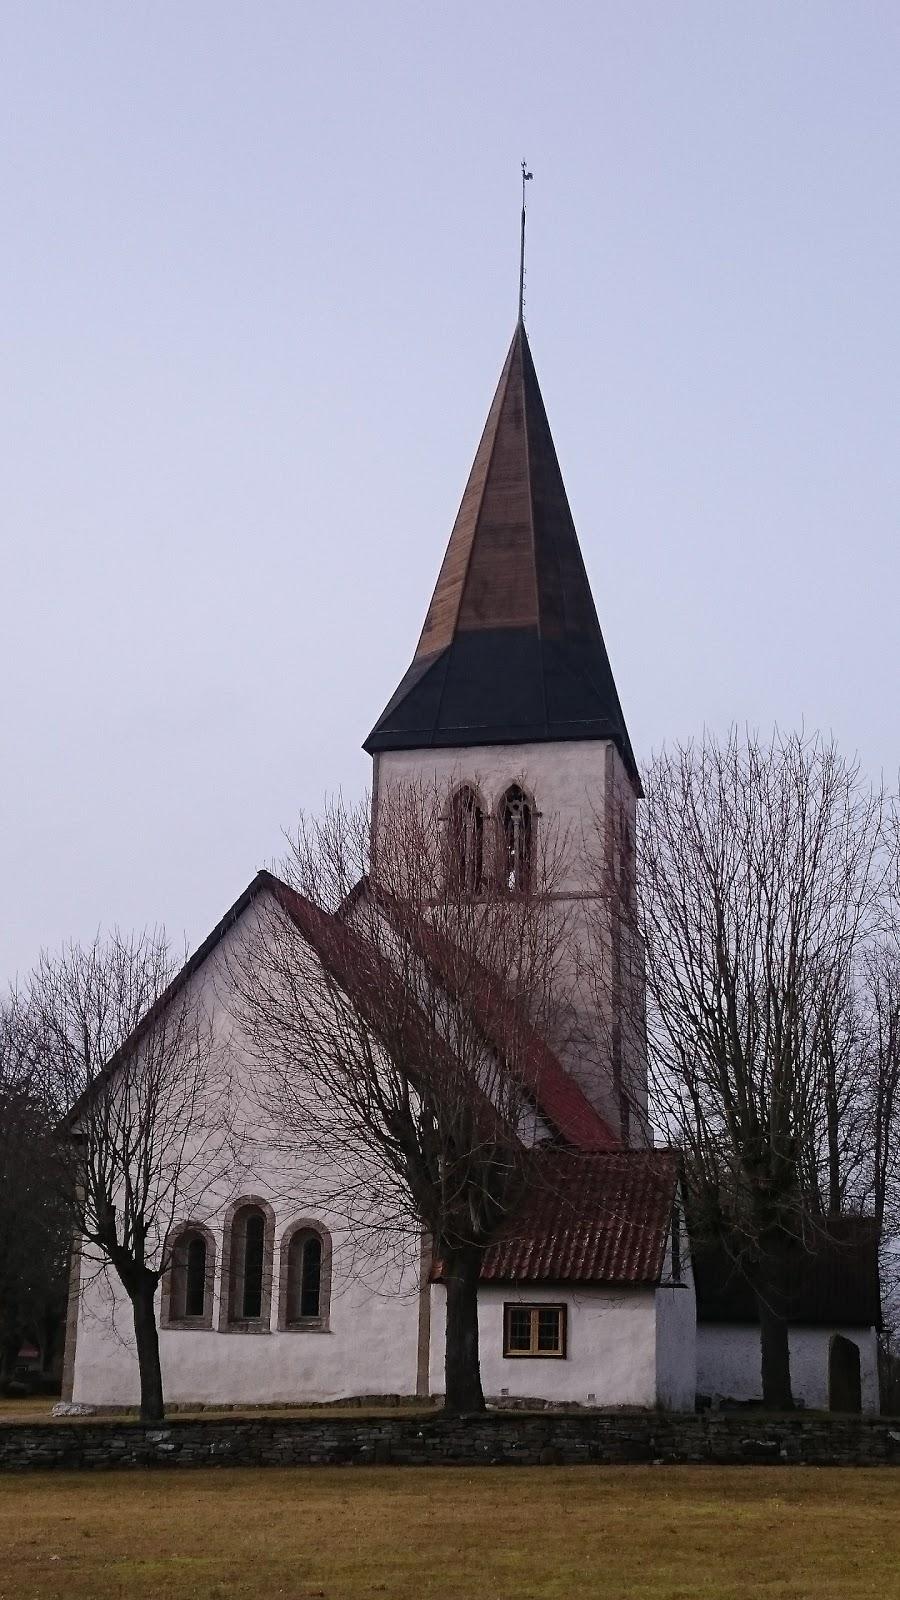 Eke kyrka